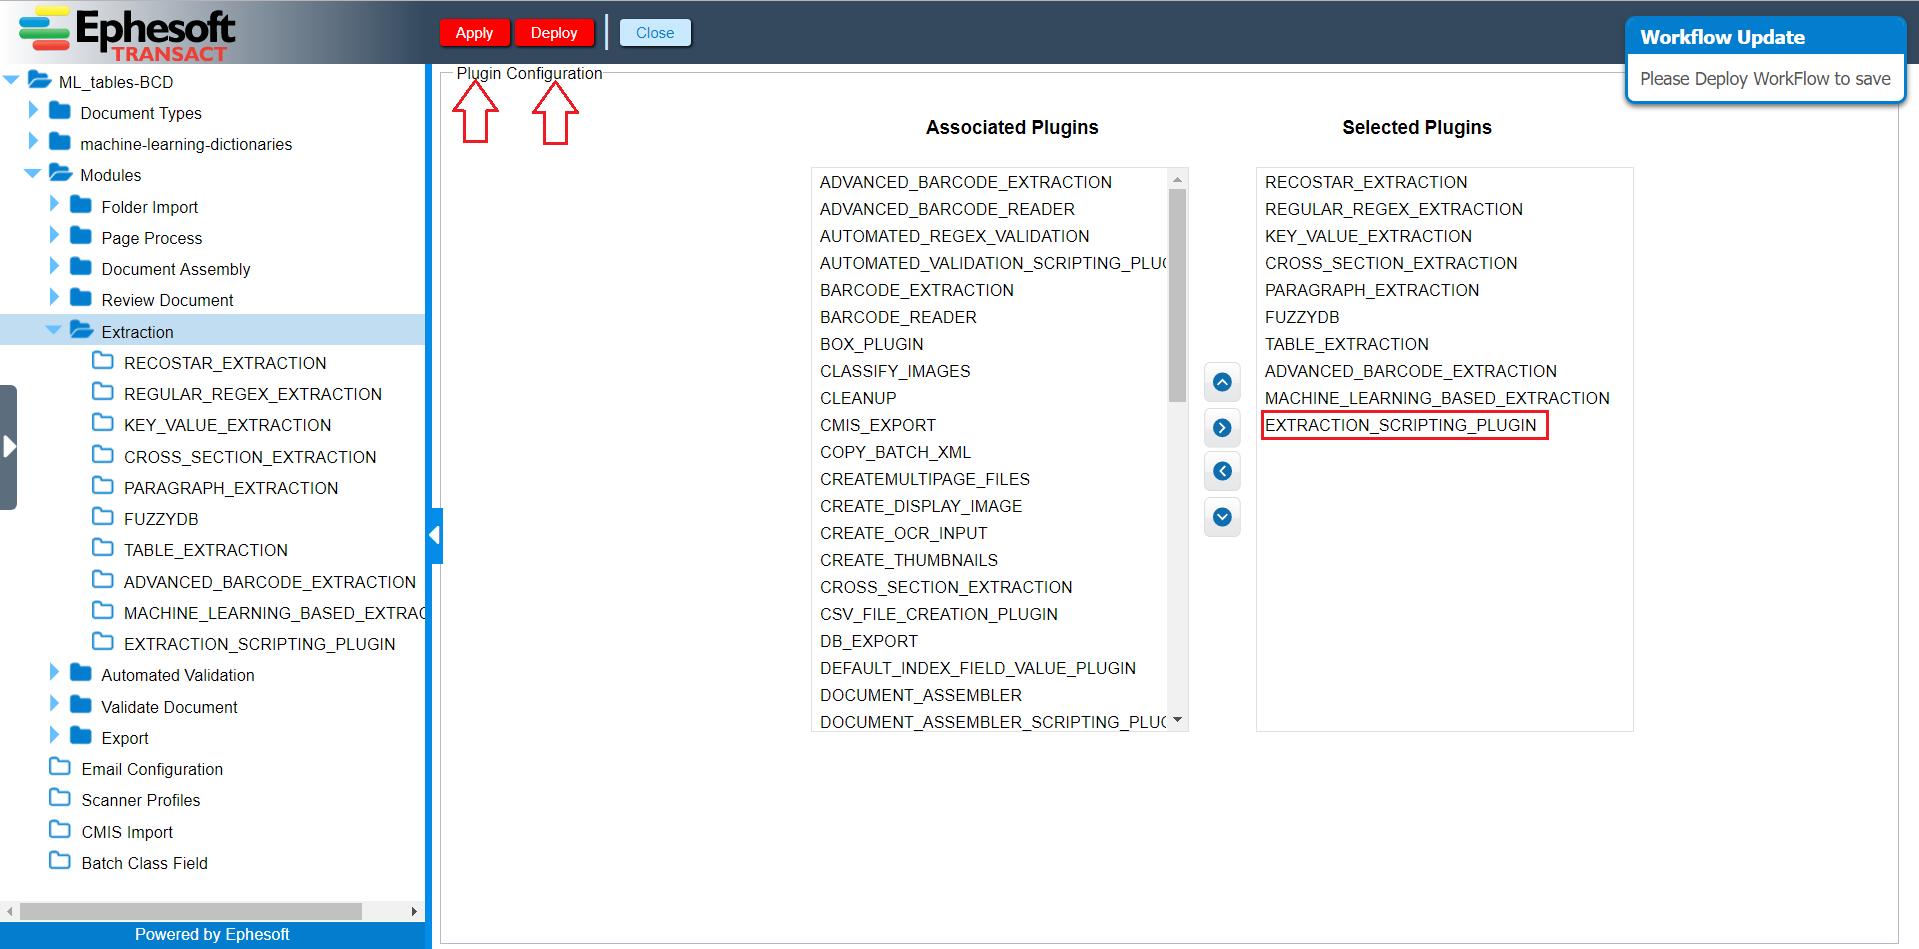 C:\Users\Ephesoft\AppData\Local\Microsoft\Windows\INetCache\Content.Word\25.png